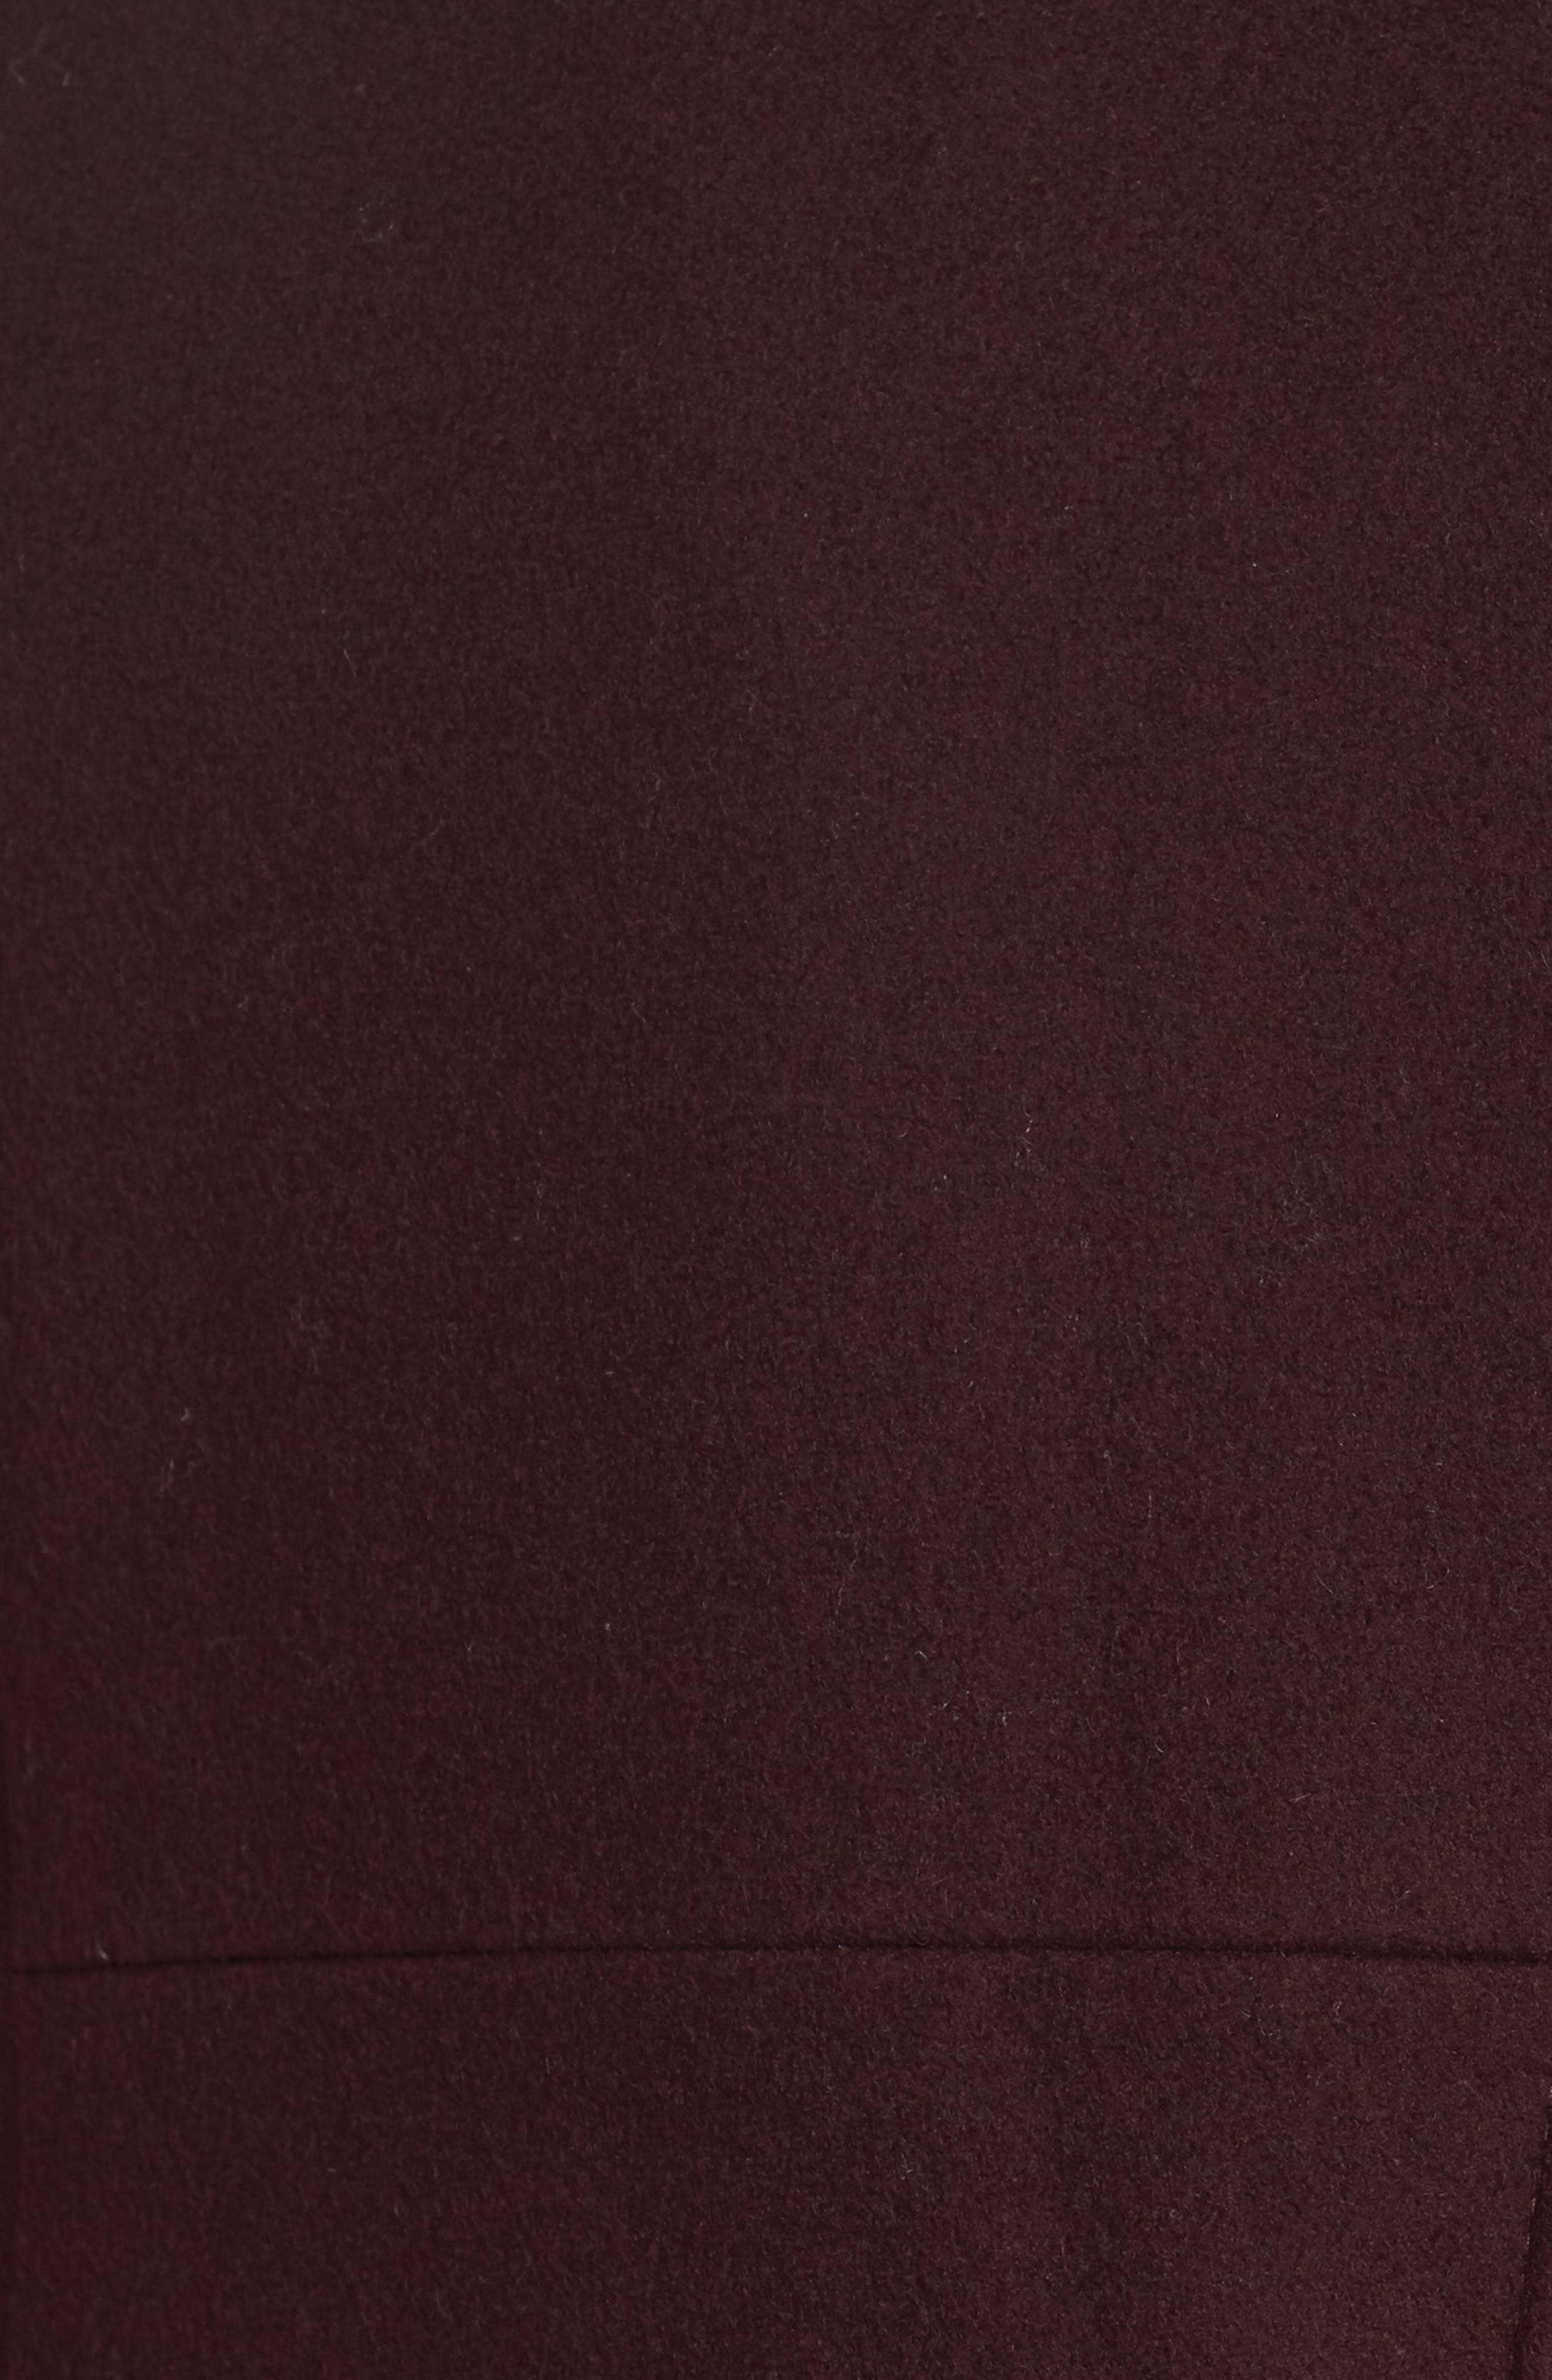 Asymmetrical Zip Wool Blend Coat,                             Alternate thumbnail 7, color,                             WINE